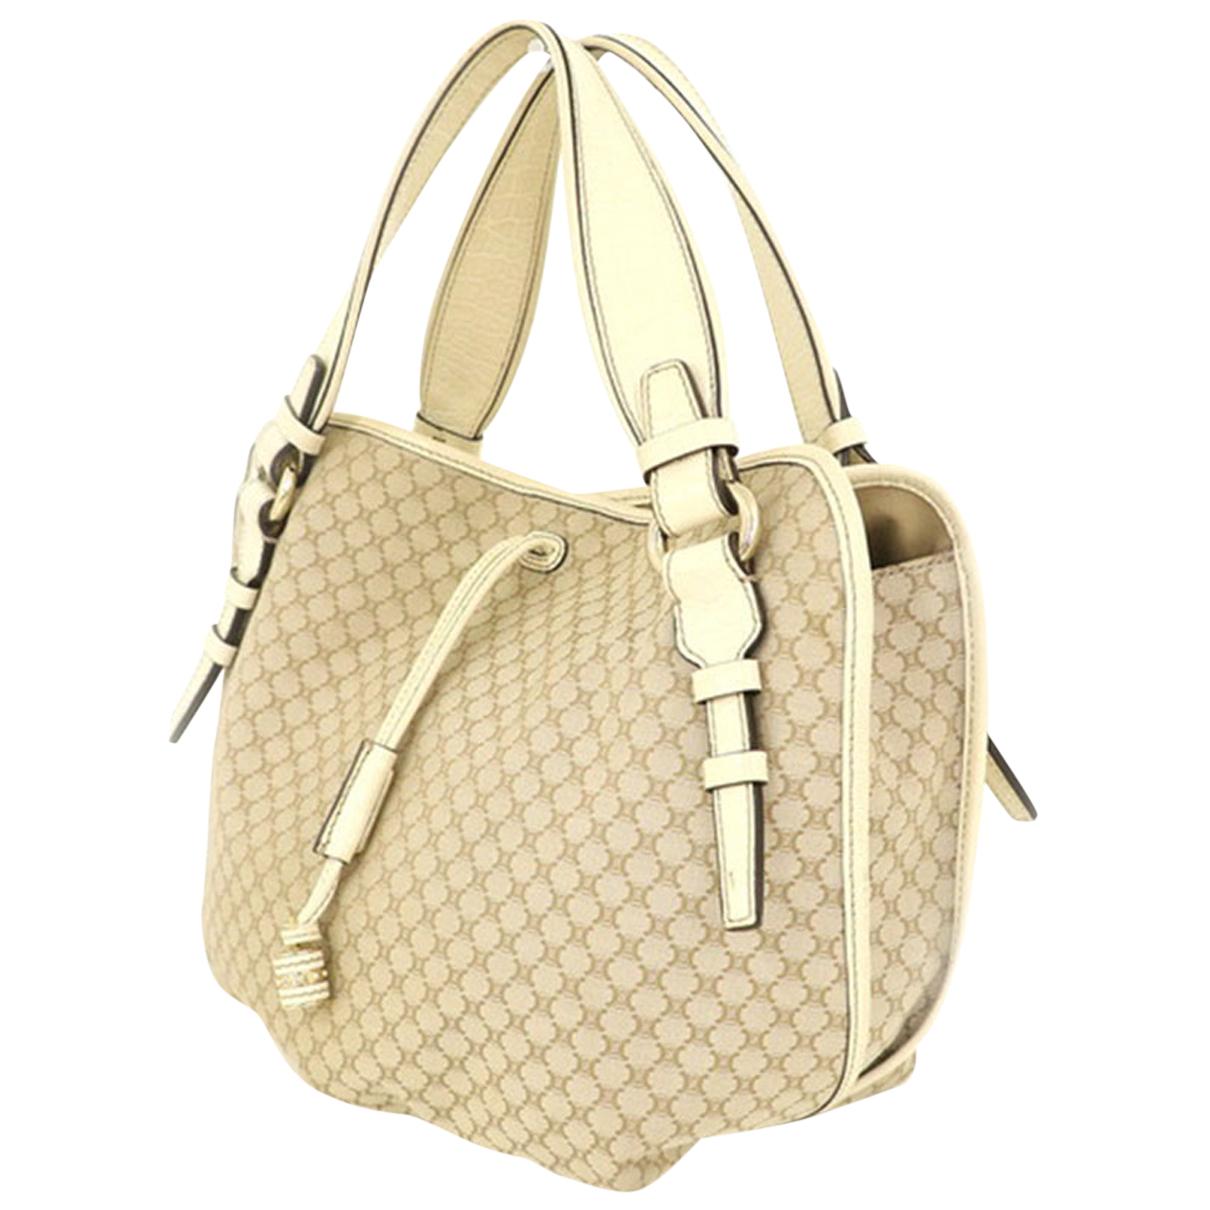 Celine N Beige Leather handbag for Women N